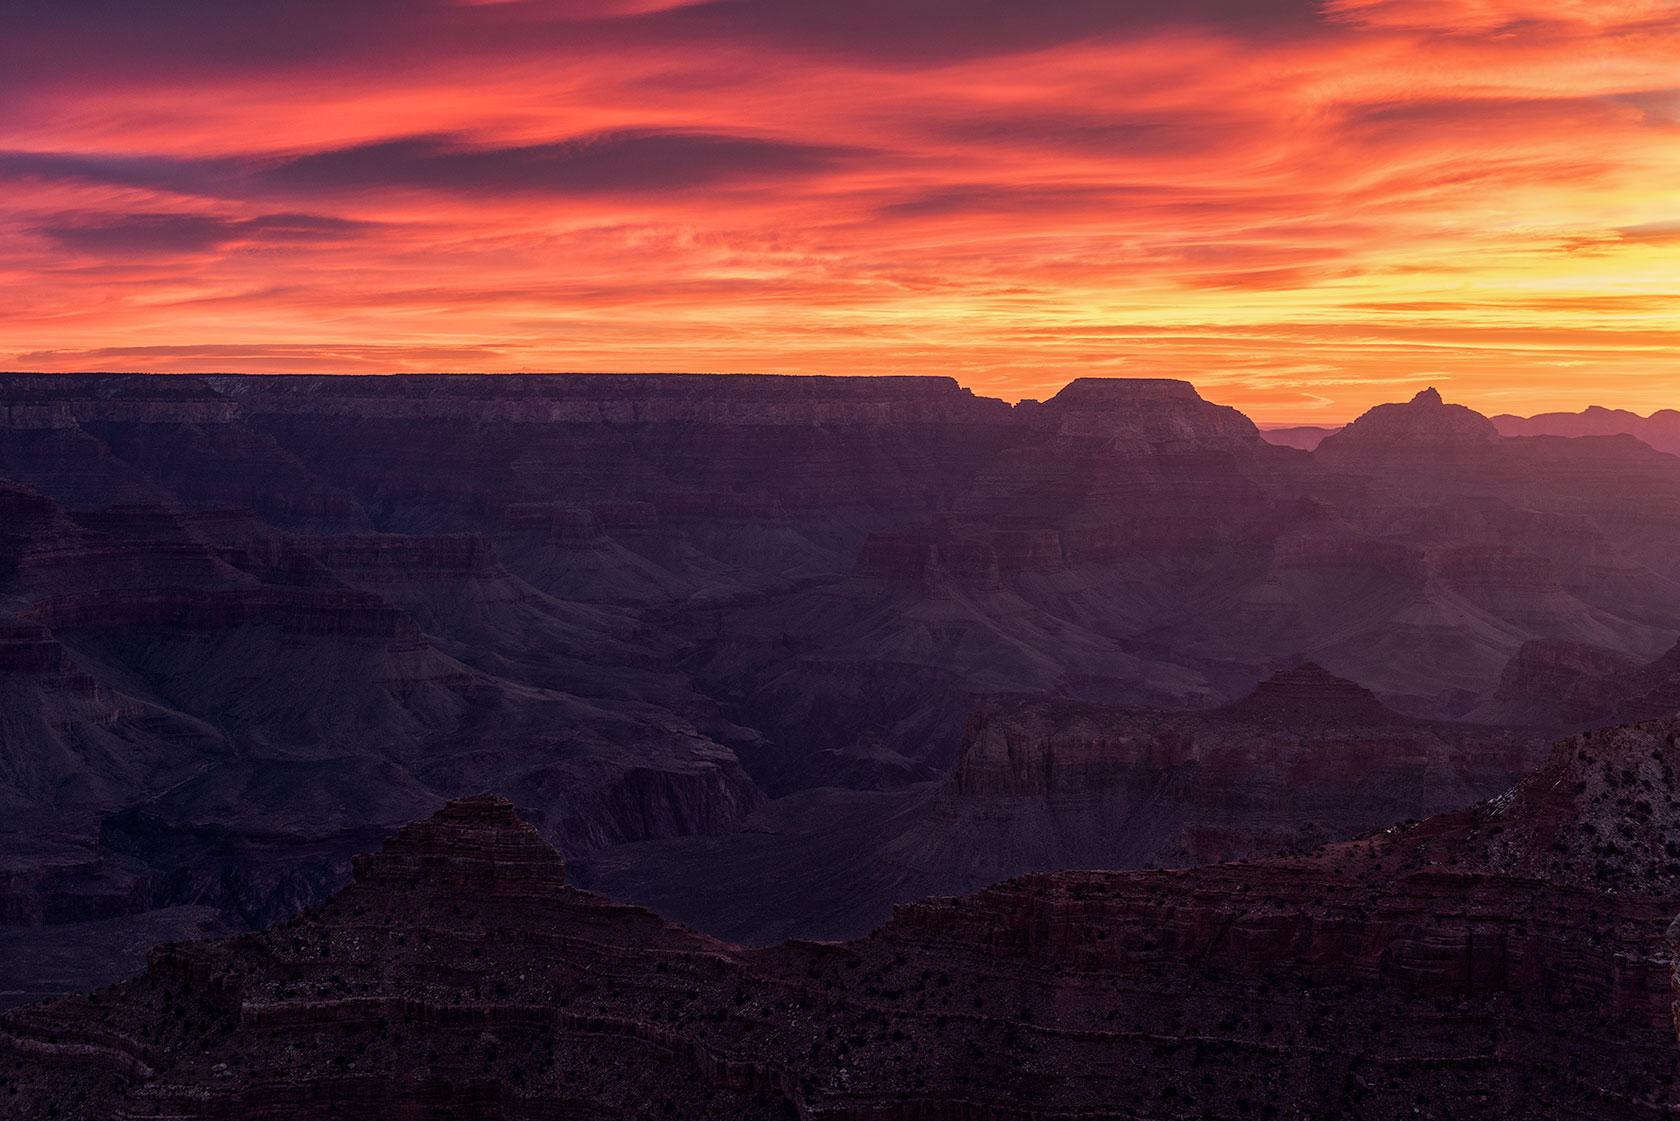 austin-trigg-osprey-hiking-backpack-hike-national-park-grand-canyon-desert-Sunrise-Mather-Point.jpg